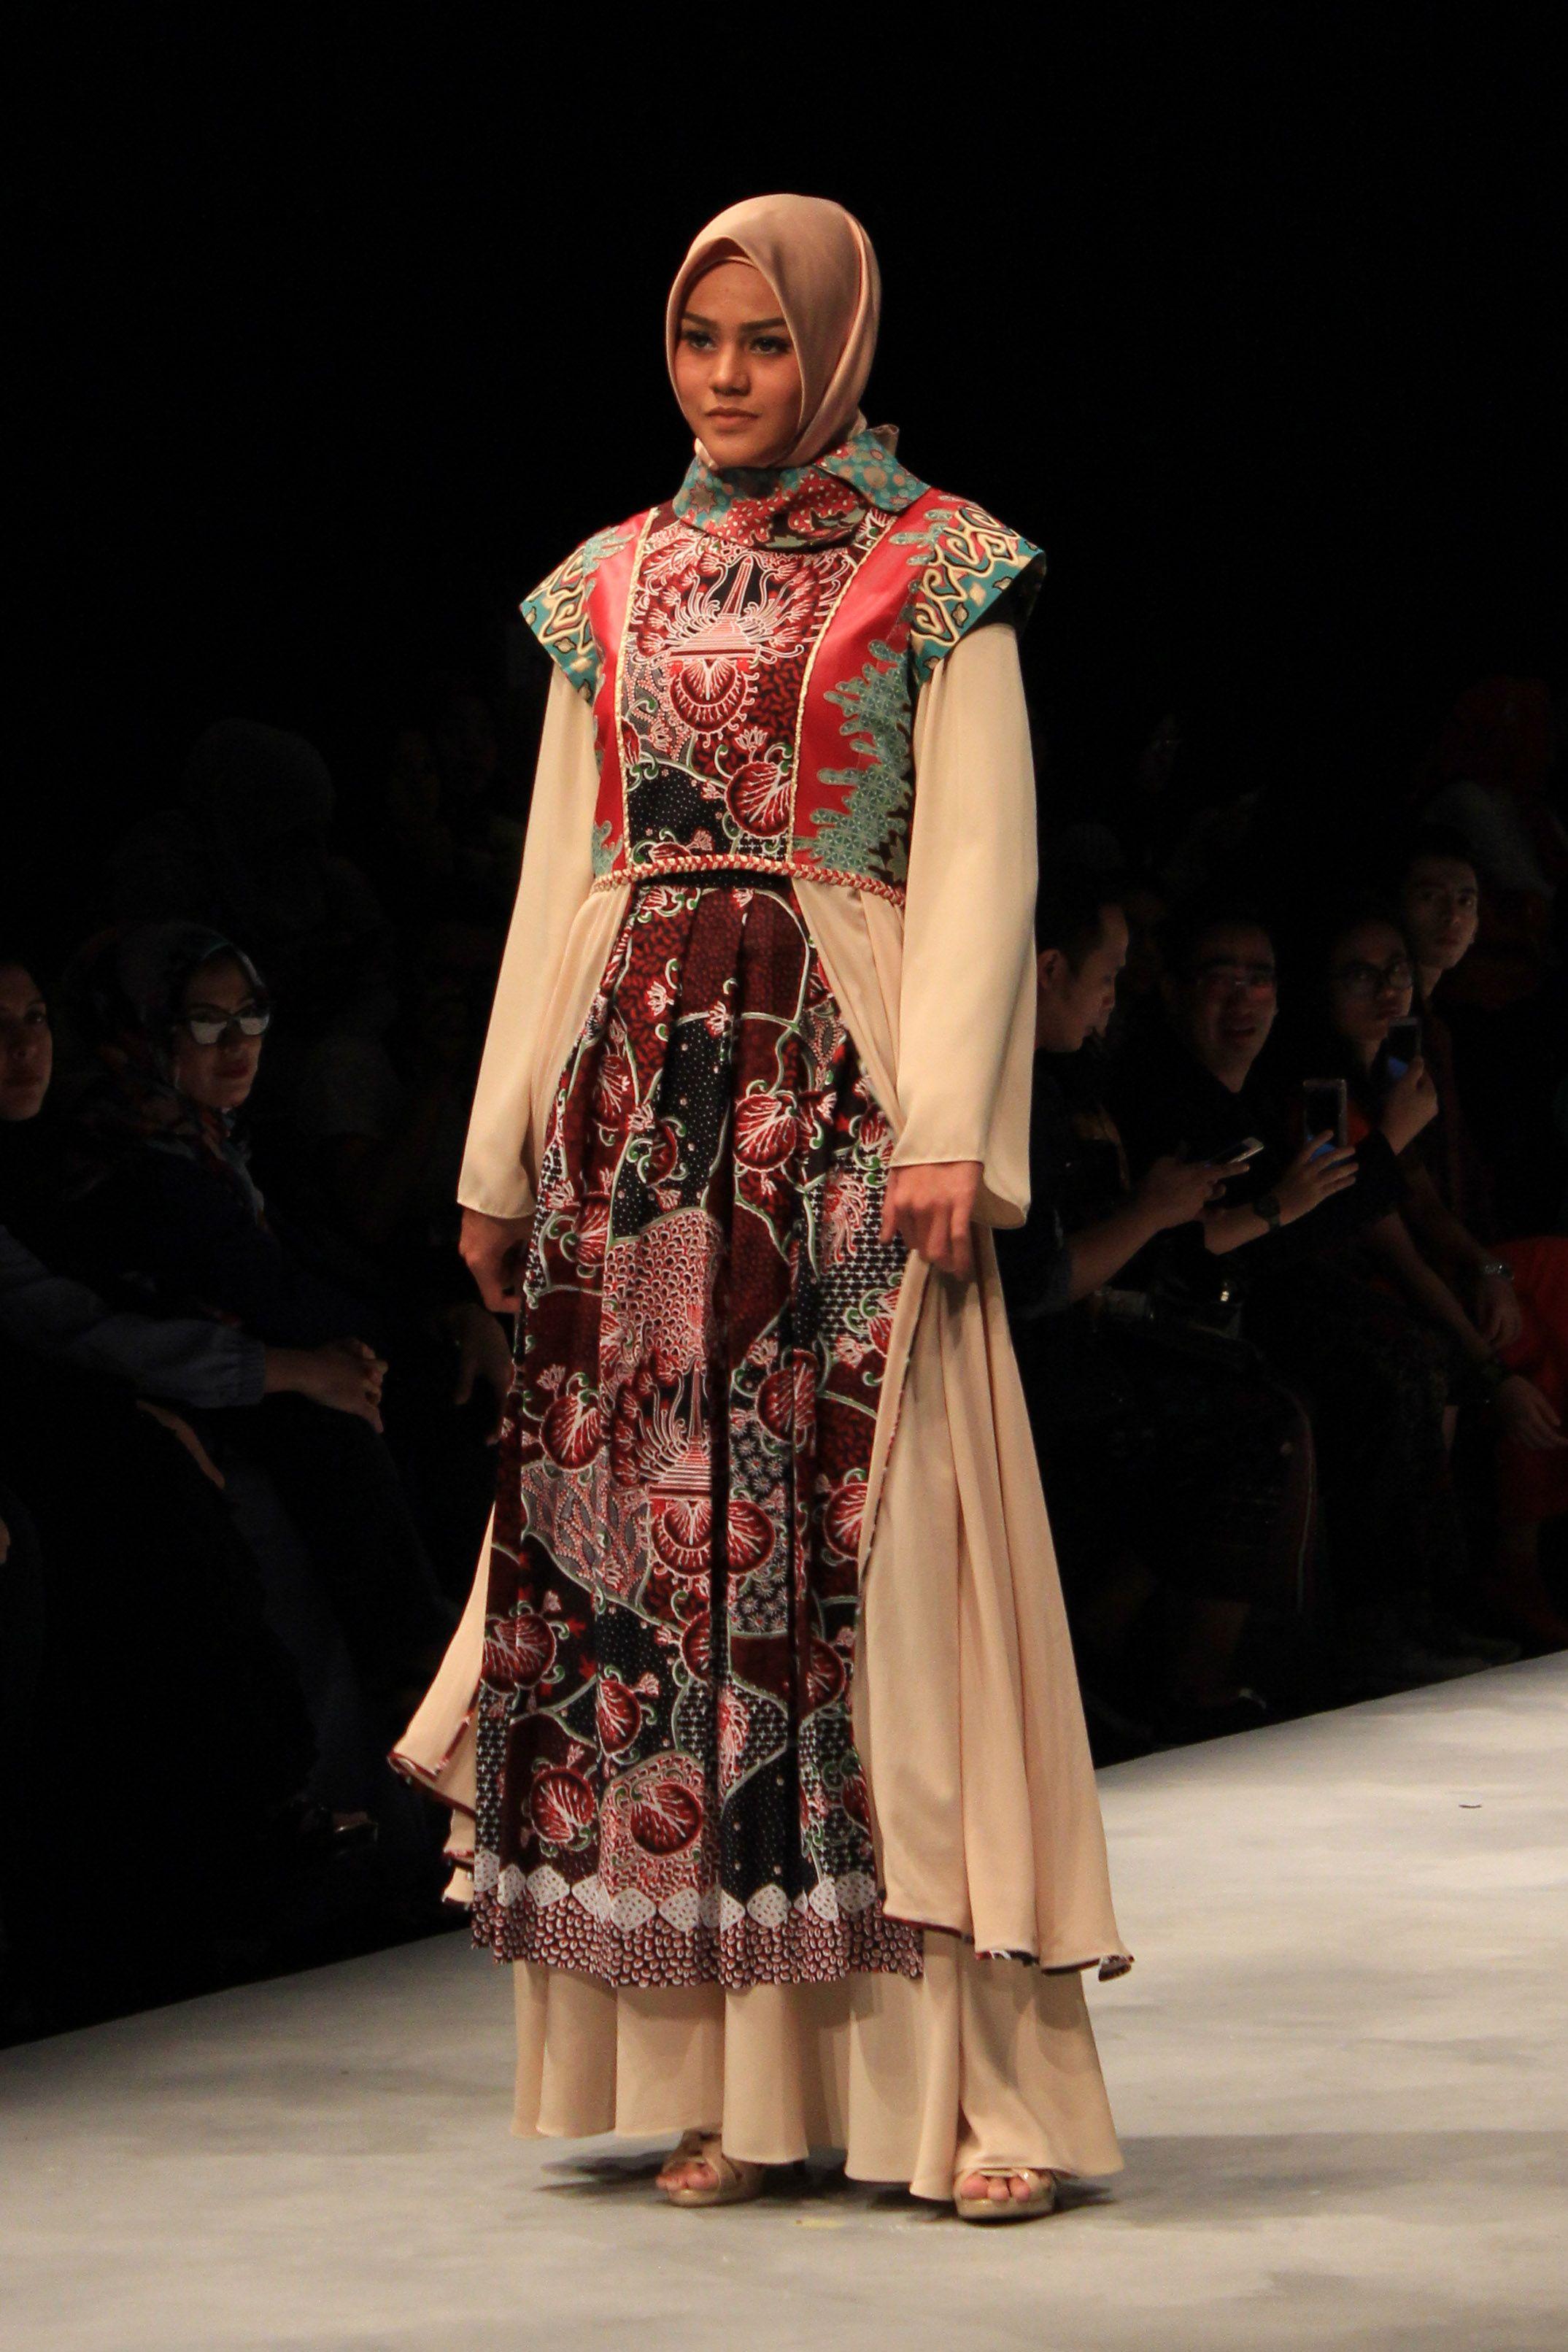 Sentuhan Batik Bikin Gaya Hijab Kamu jadi Trendi Banget